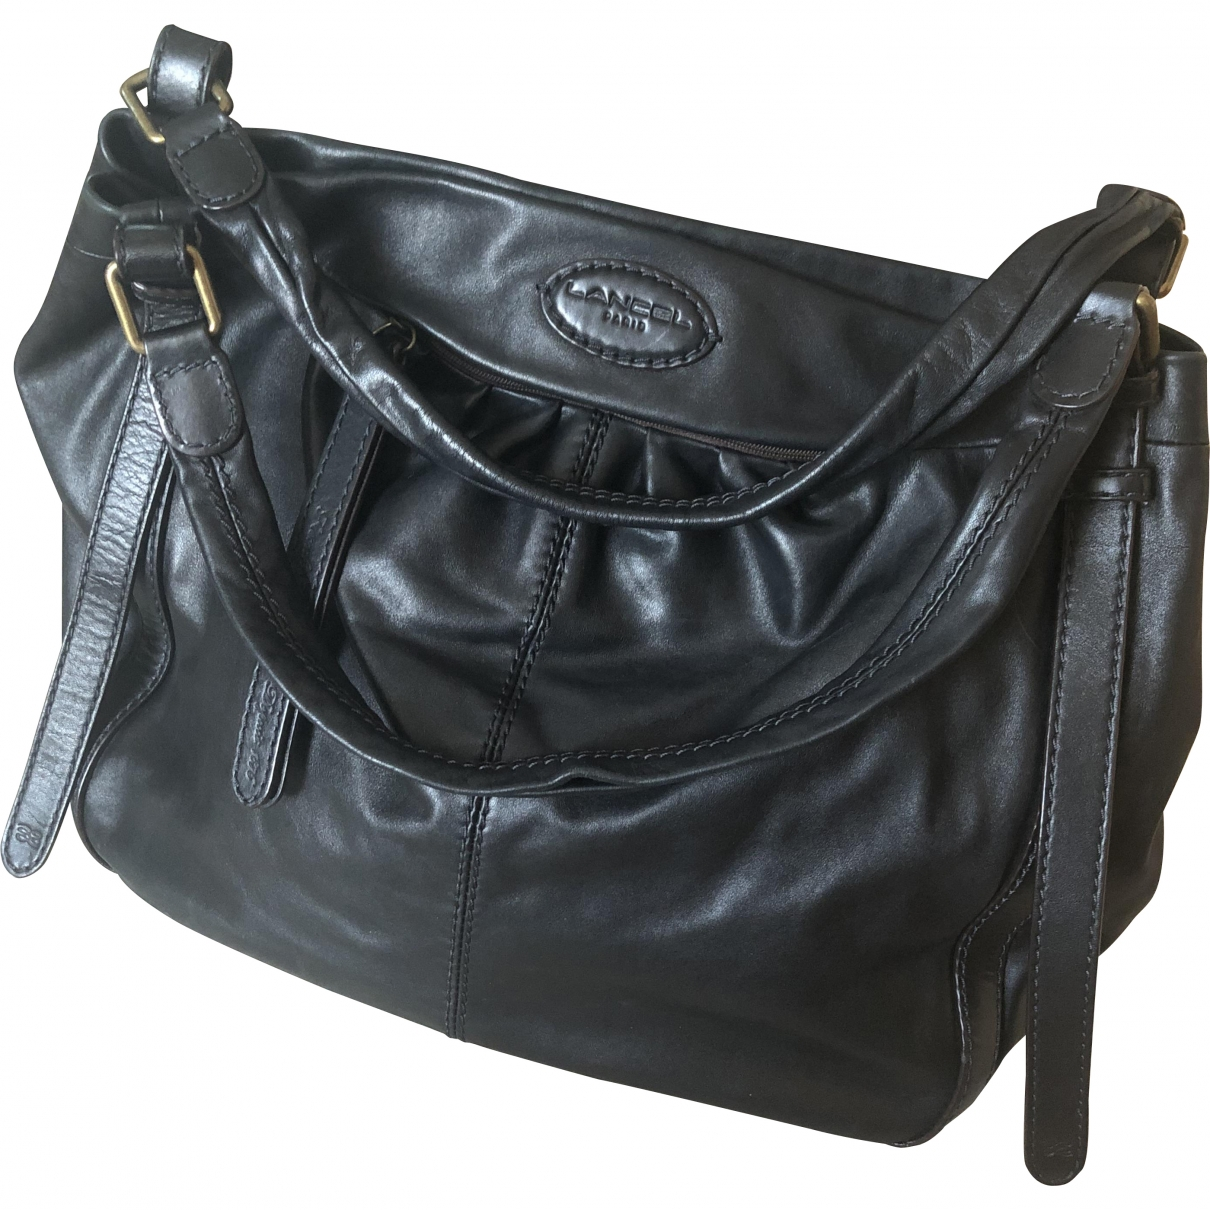 Lancel \N Black Leather handbag for Women \N